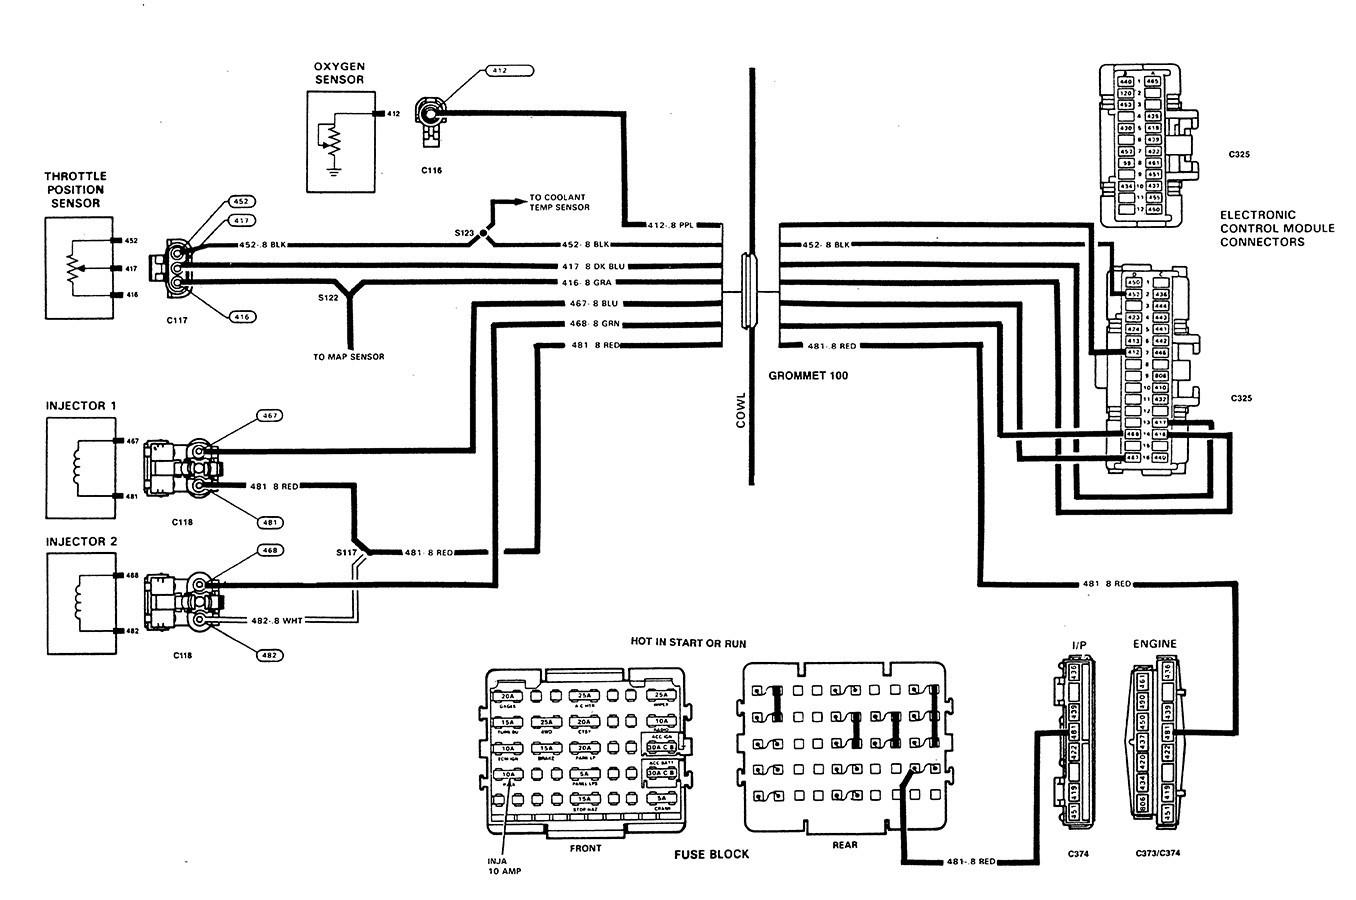 hight resolution of 96 tahoe o2 sensor wiring diagram wiring diagram services 2005 chevrolet suburban 2003 chevrolet suburban z71